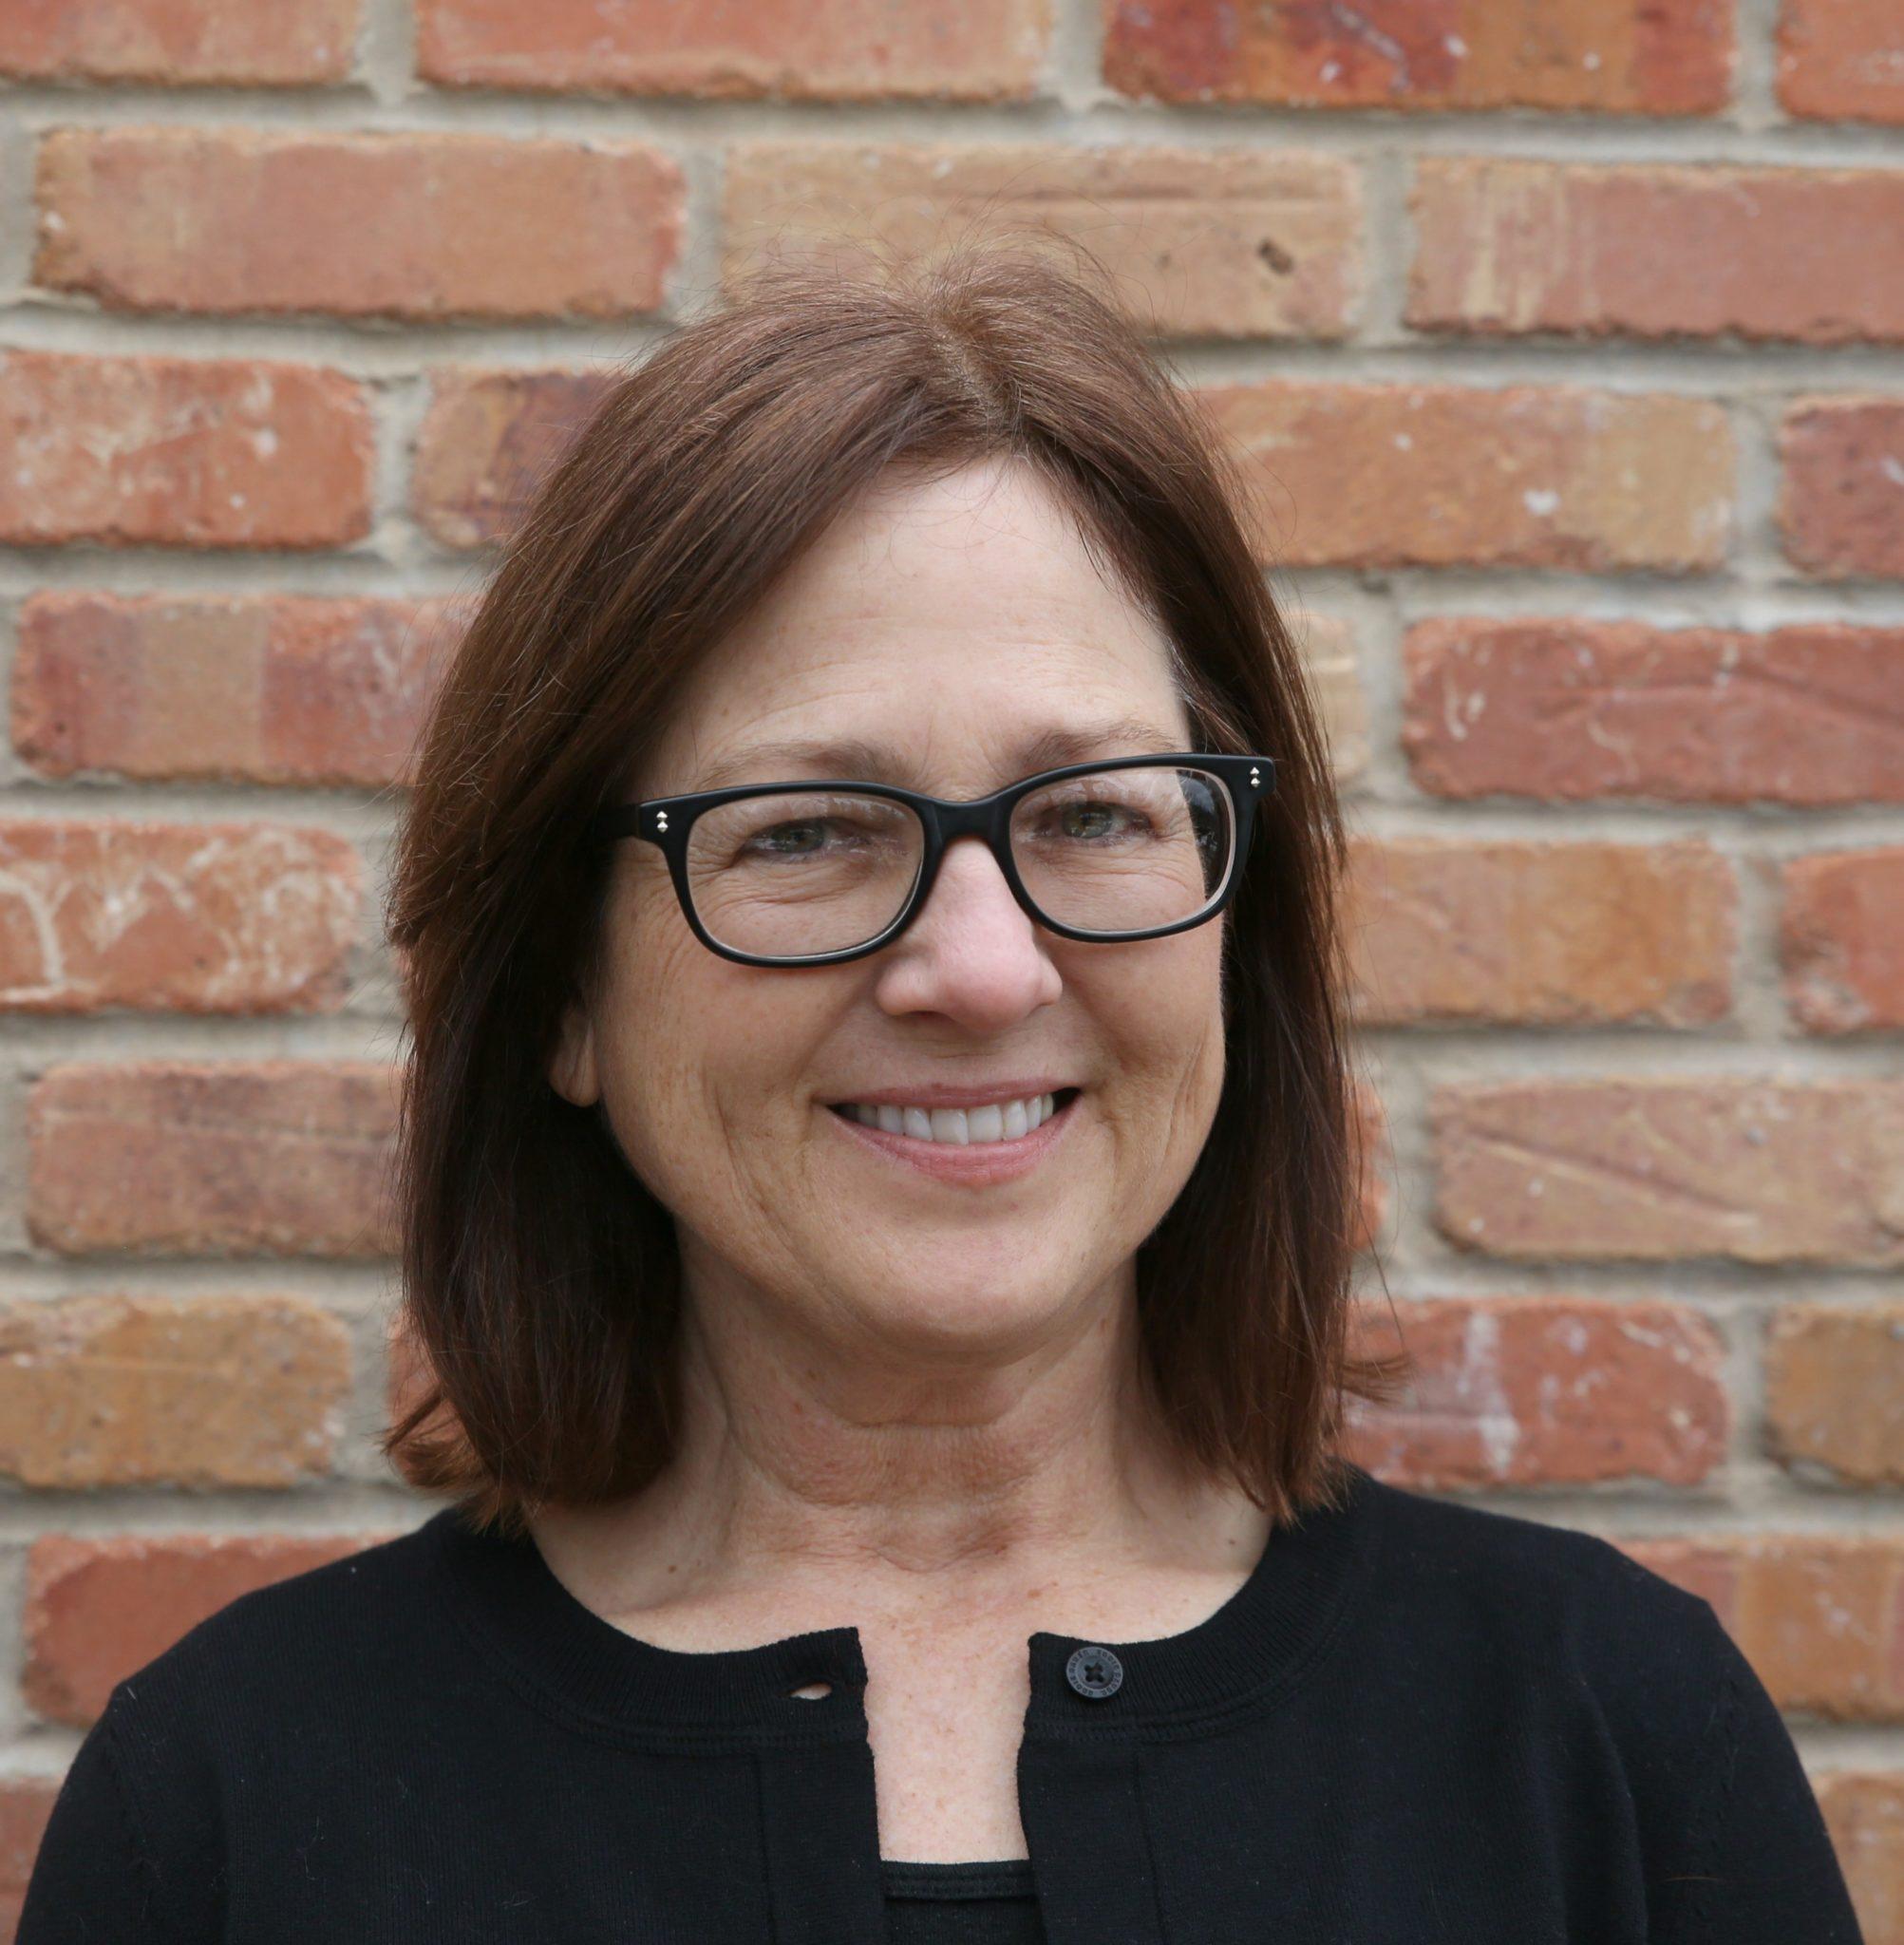 Janice Peterson